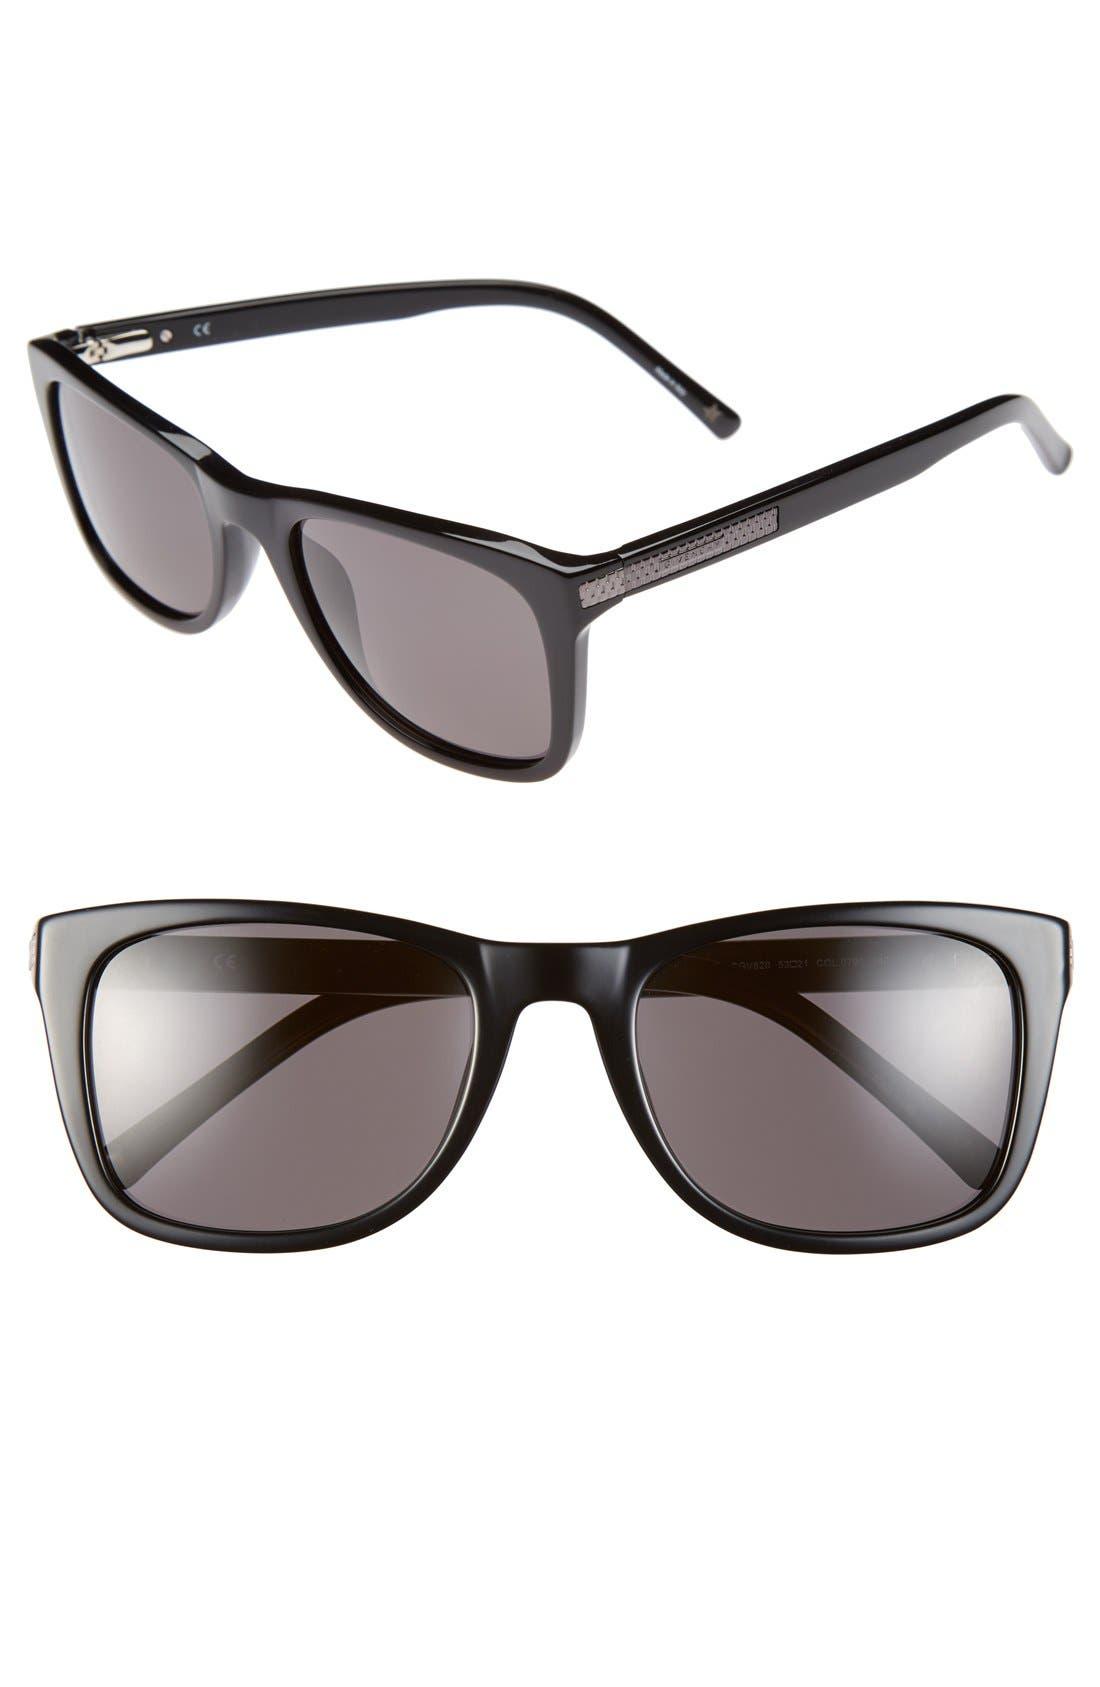 Main Image - Givenchy 53mm Sunglasses